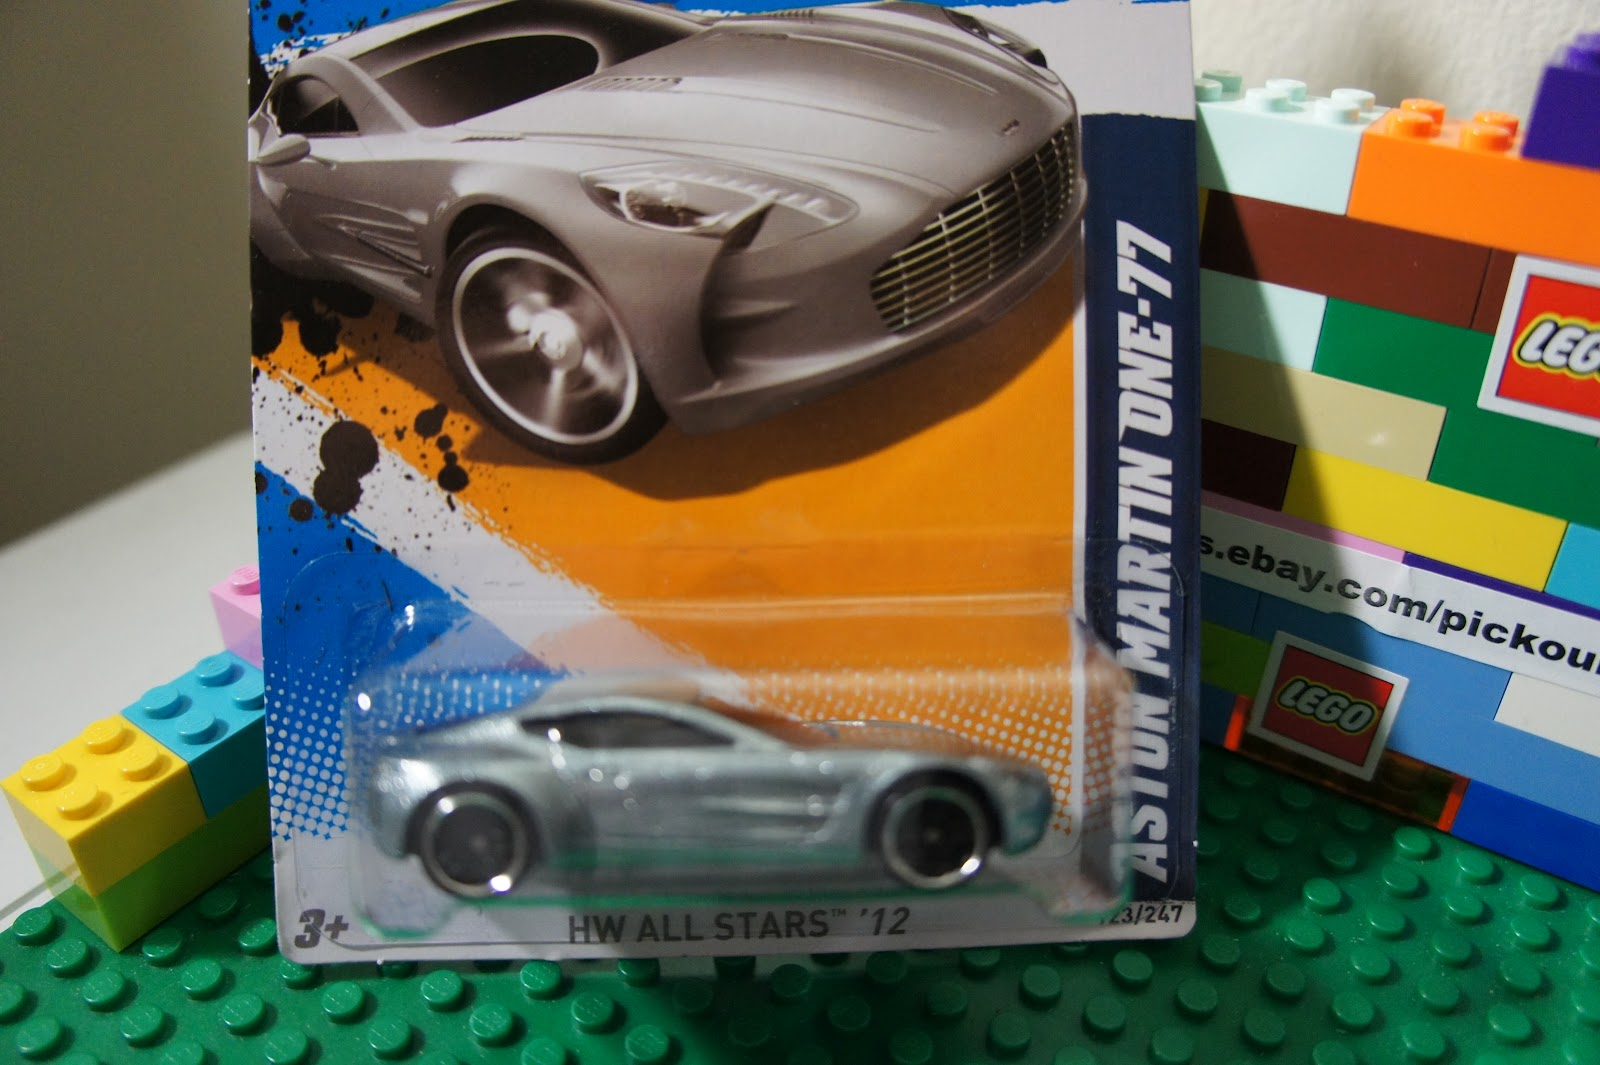 Hot Wheels Silver Chrome Aston Martin One 77 Diecast HW All Stars '12 3 10